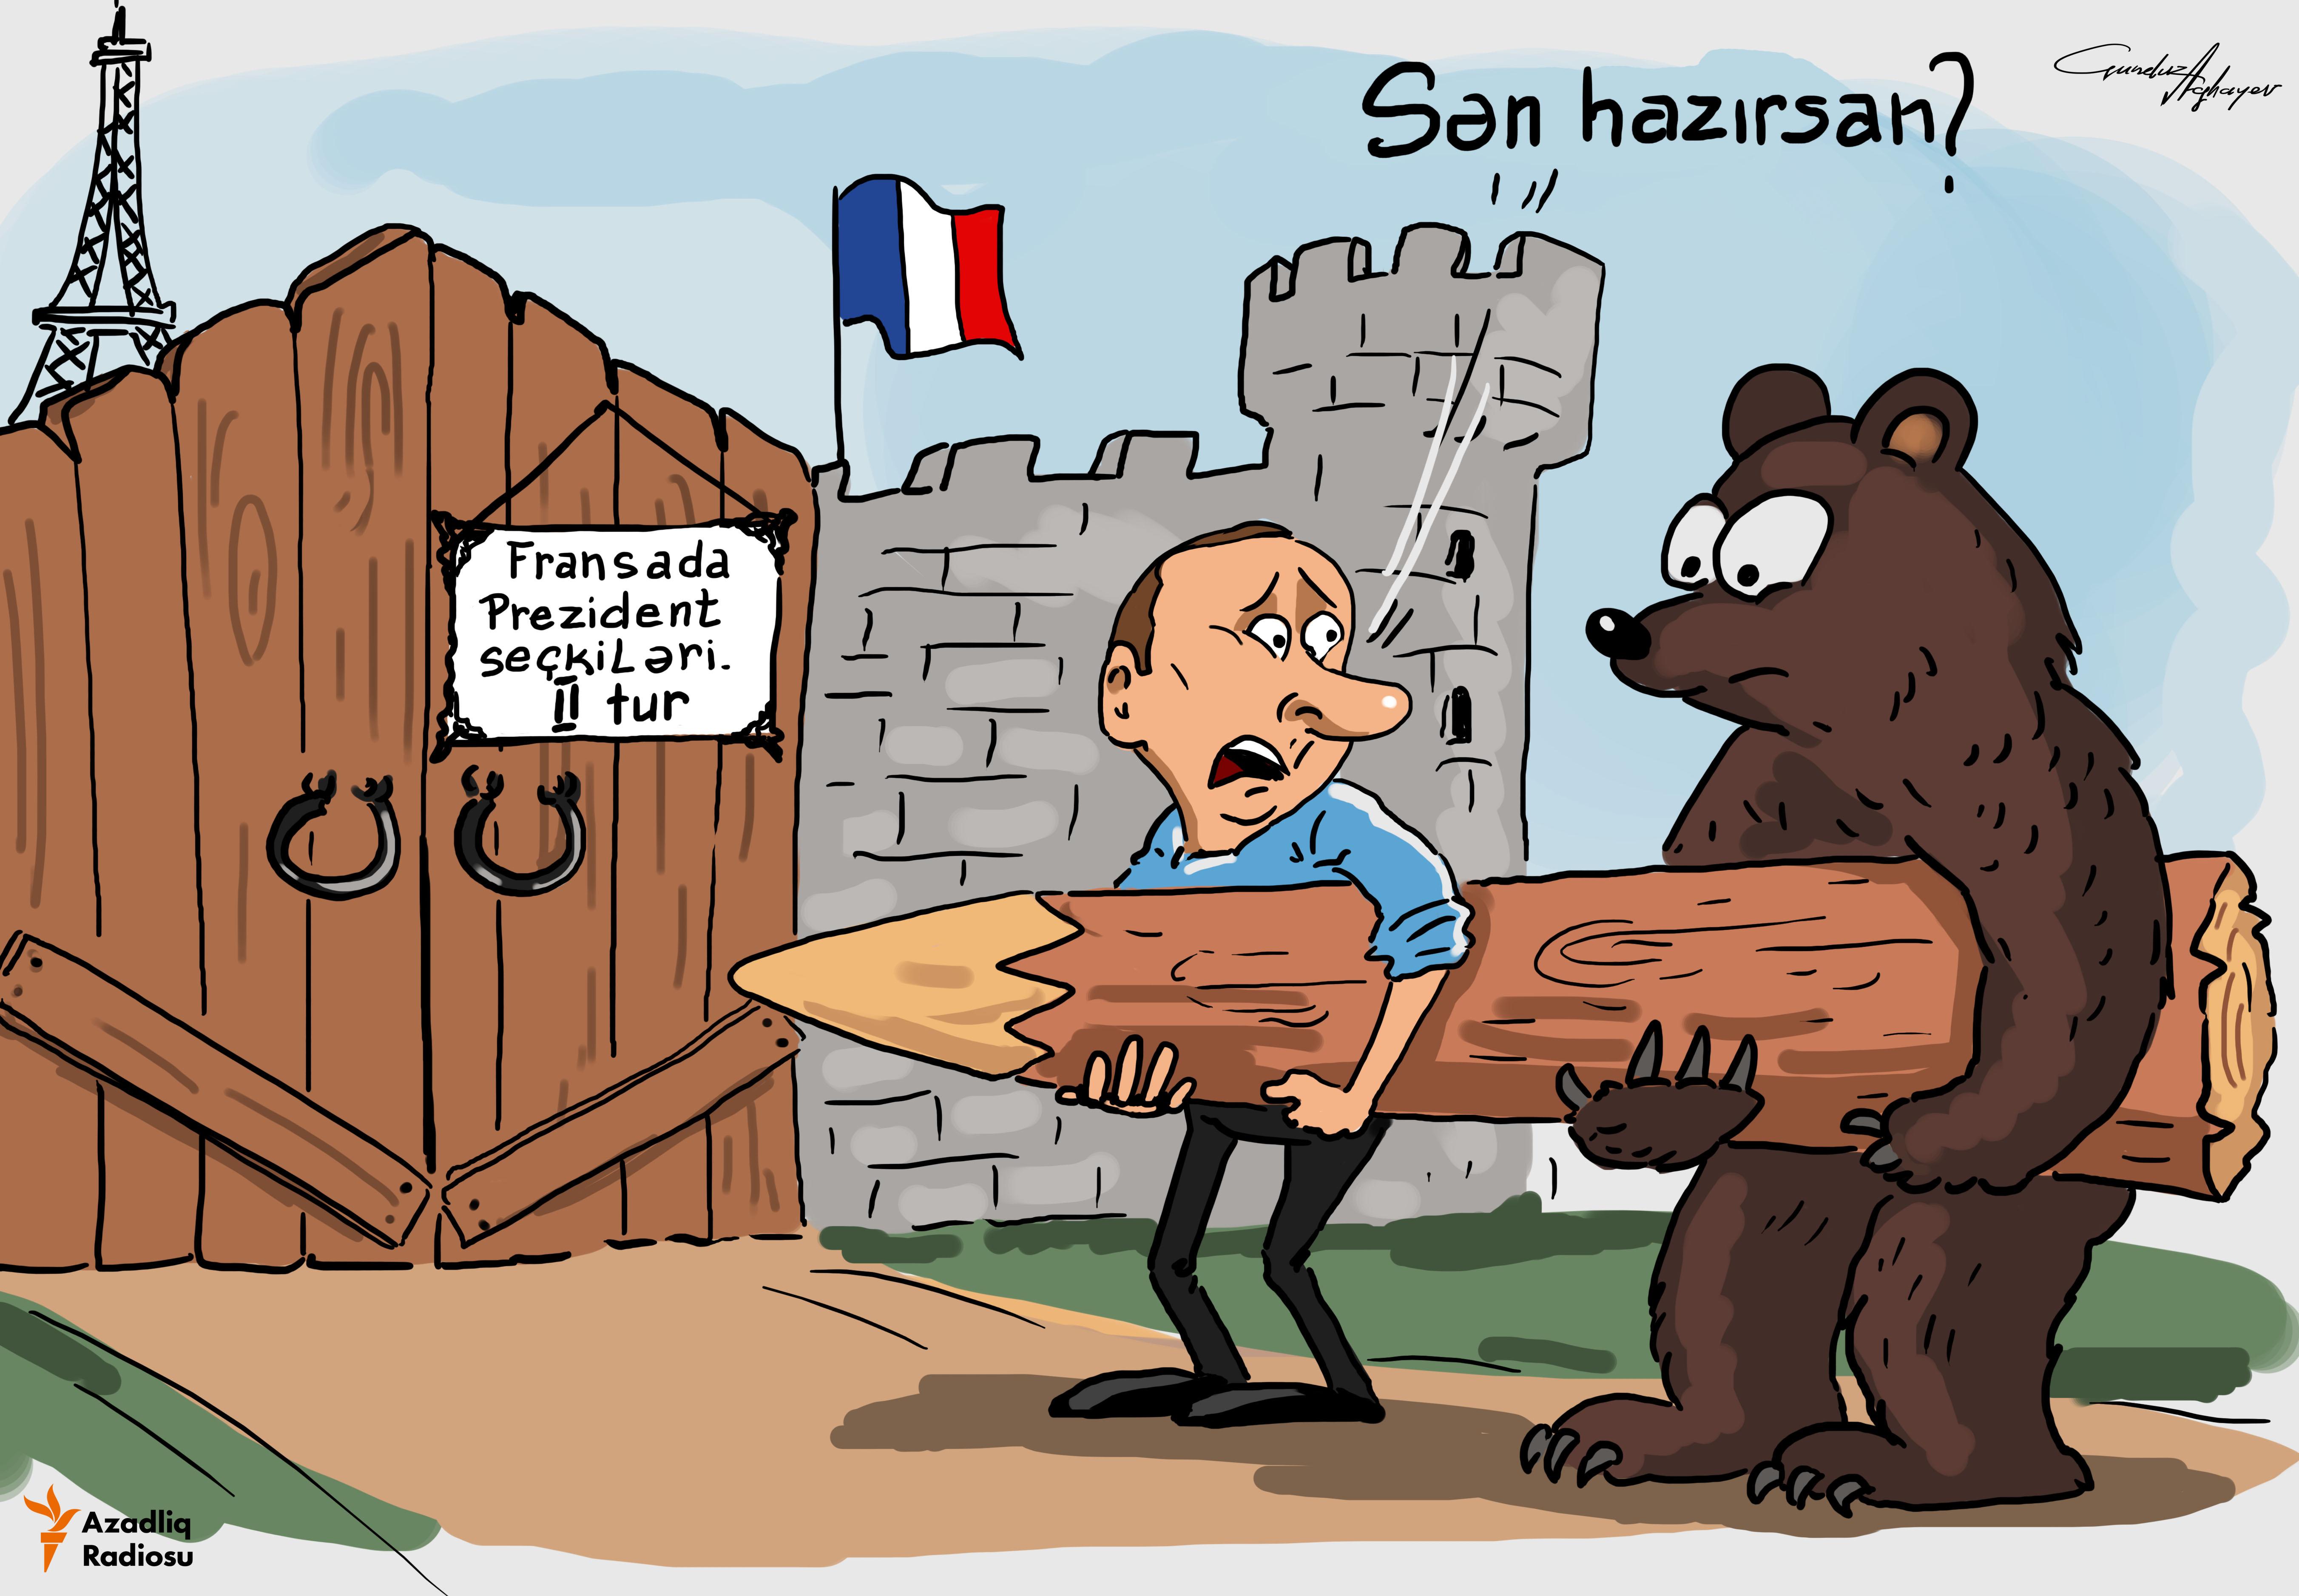 Putin-in hazırlığı